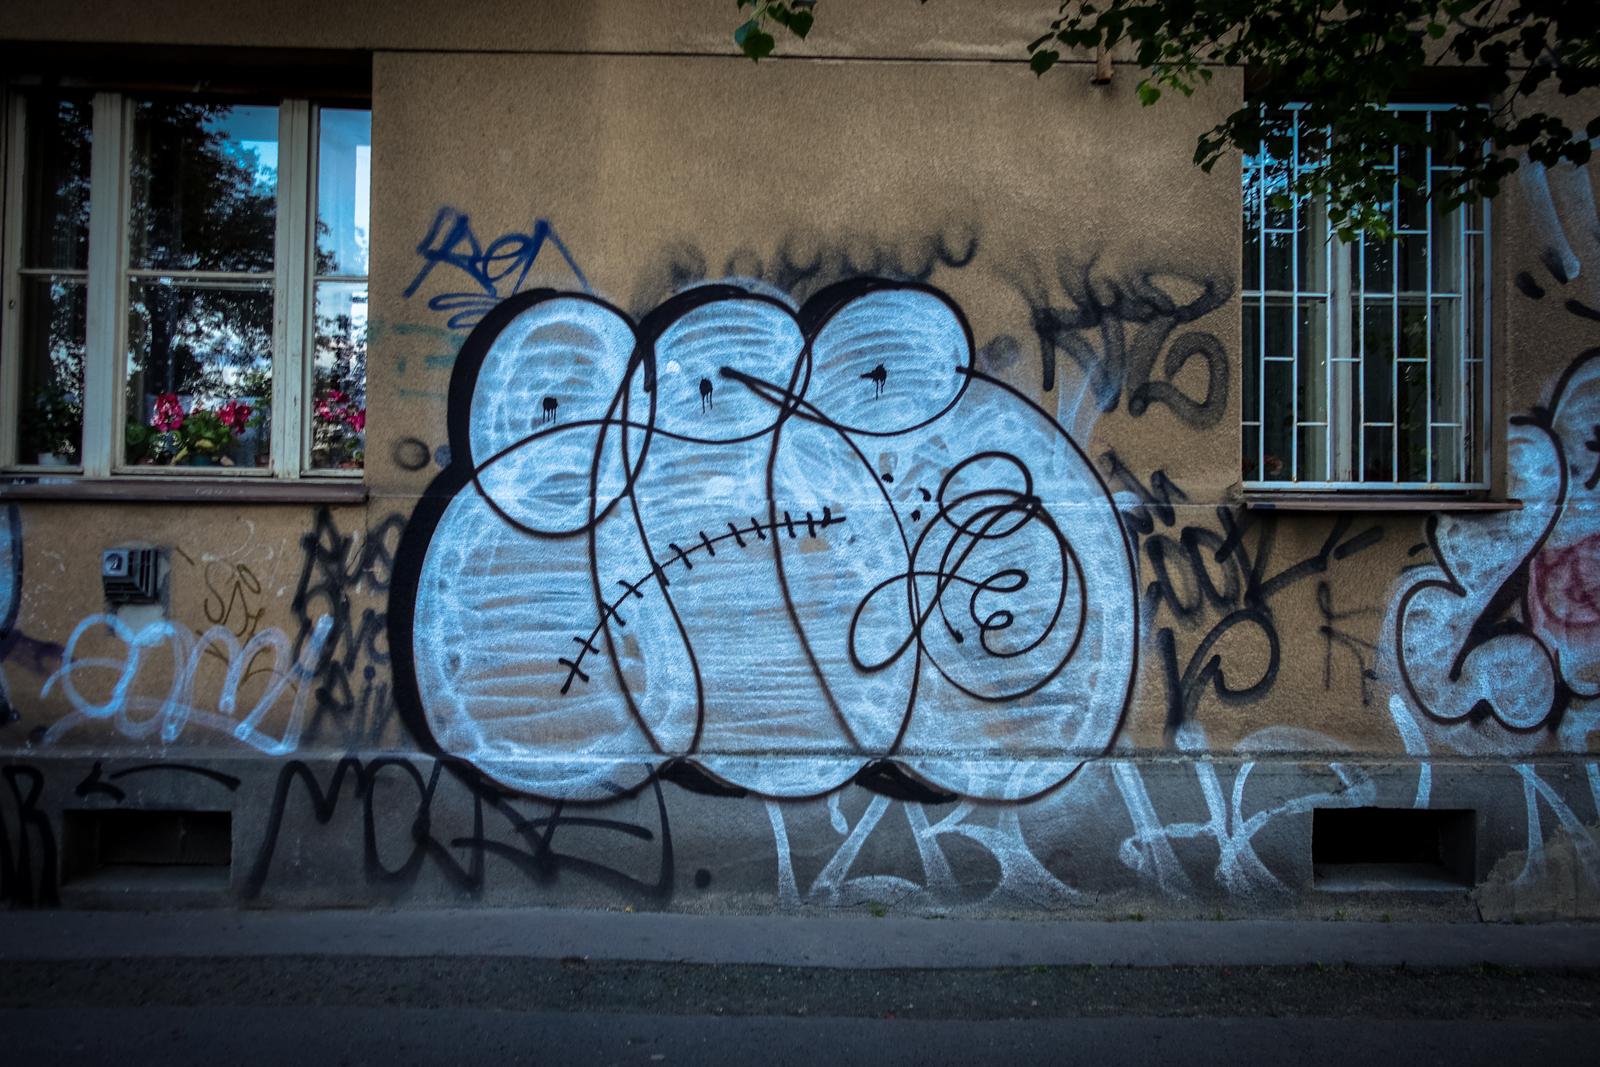 street art in prague – day 1: meetfactory & žižkov